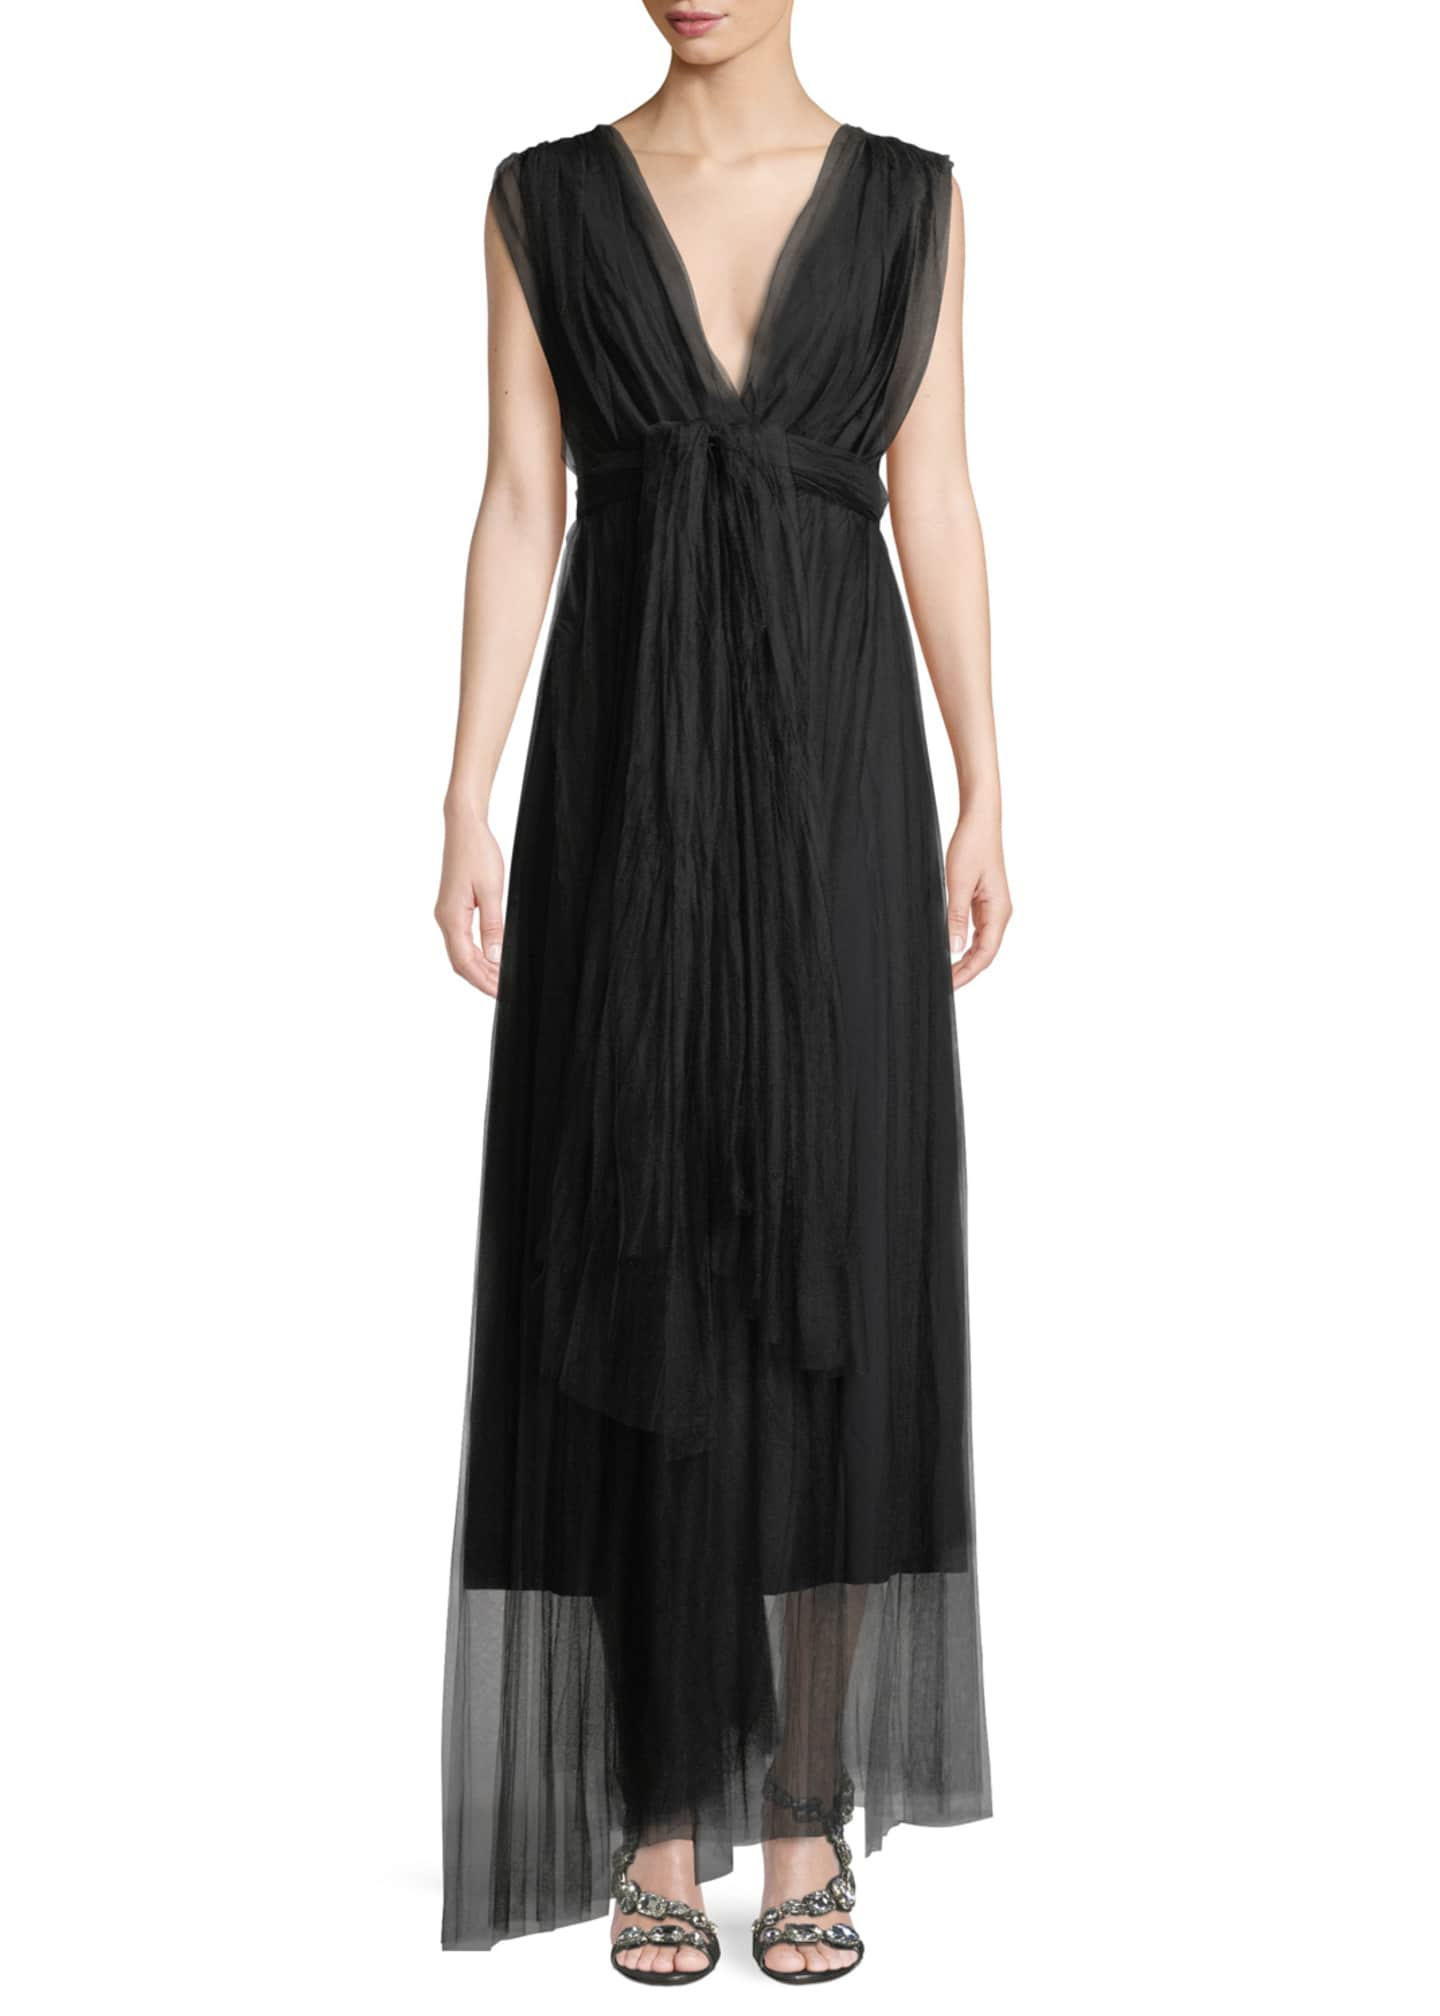 Chiara Boni La Petite Robe Vanda V-Neck Sleeveless